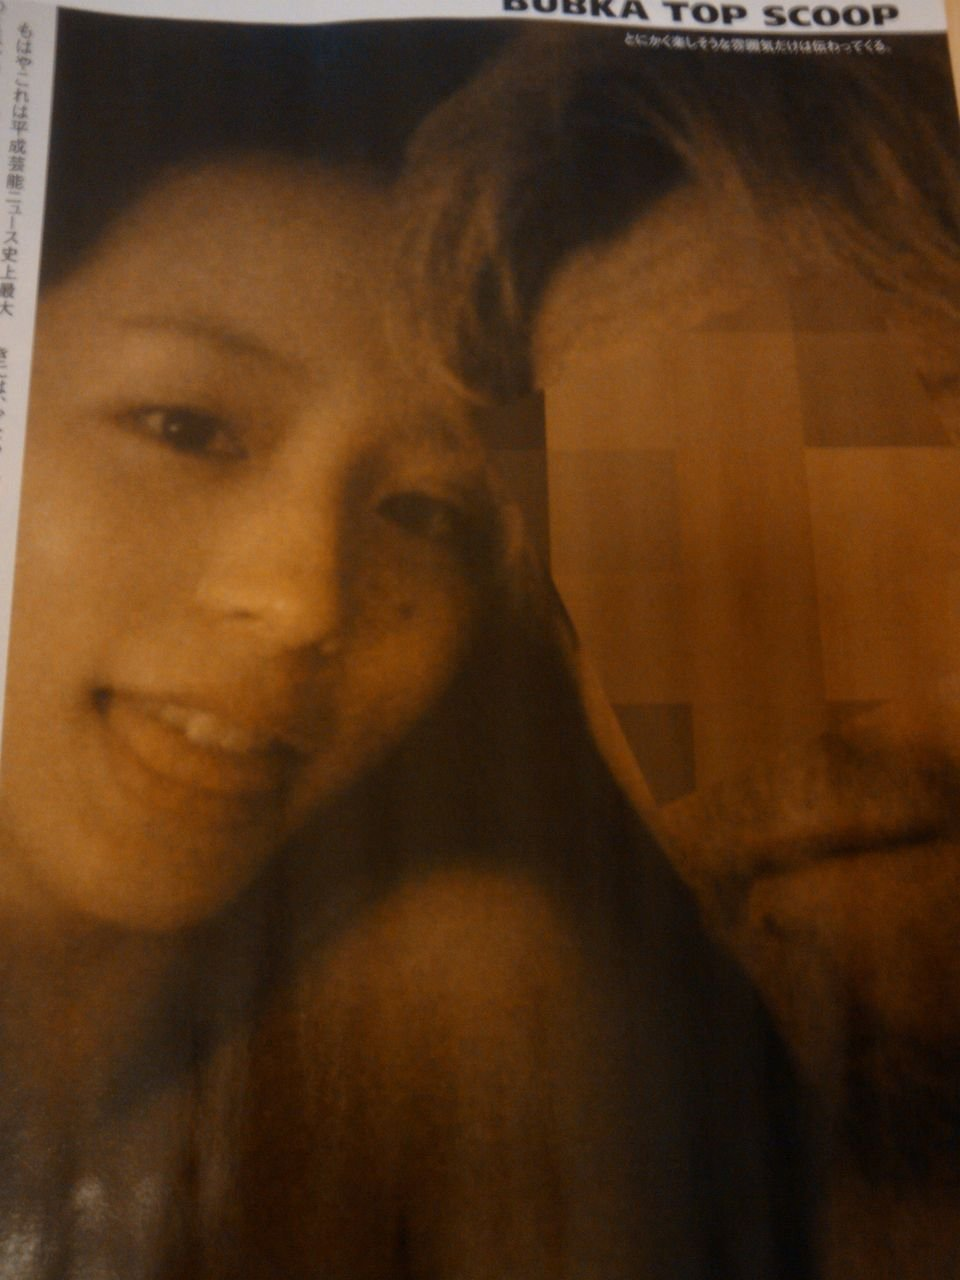 I0000236 7 - 平野綾ベッドイン写真流出から現在は?転落した声優人生は今後どうなる?